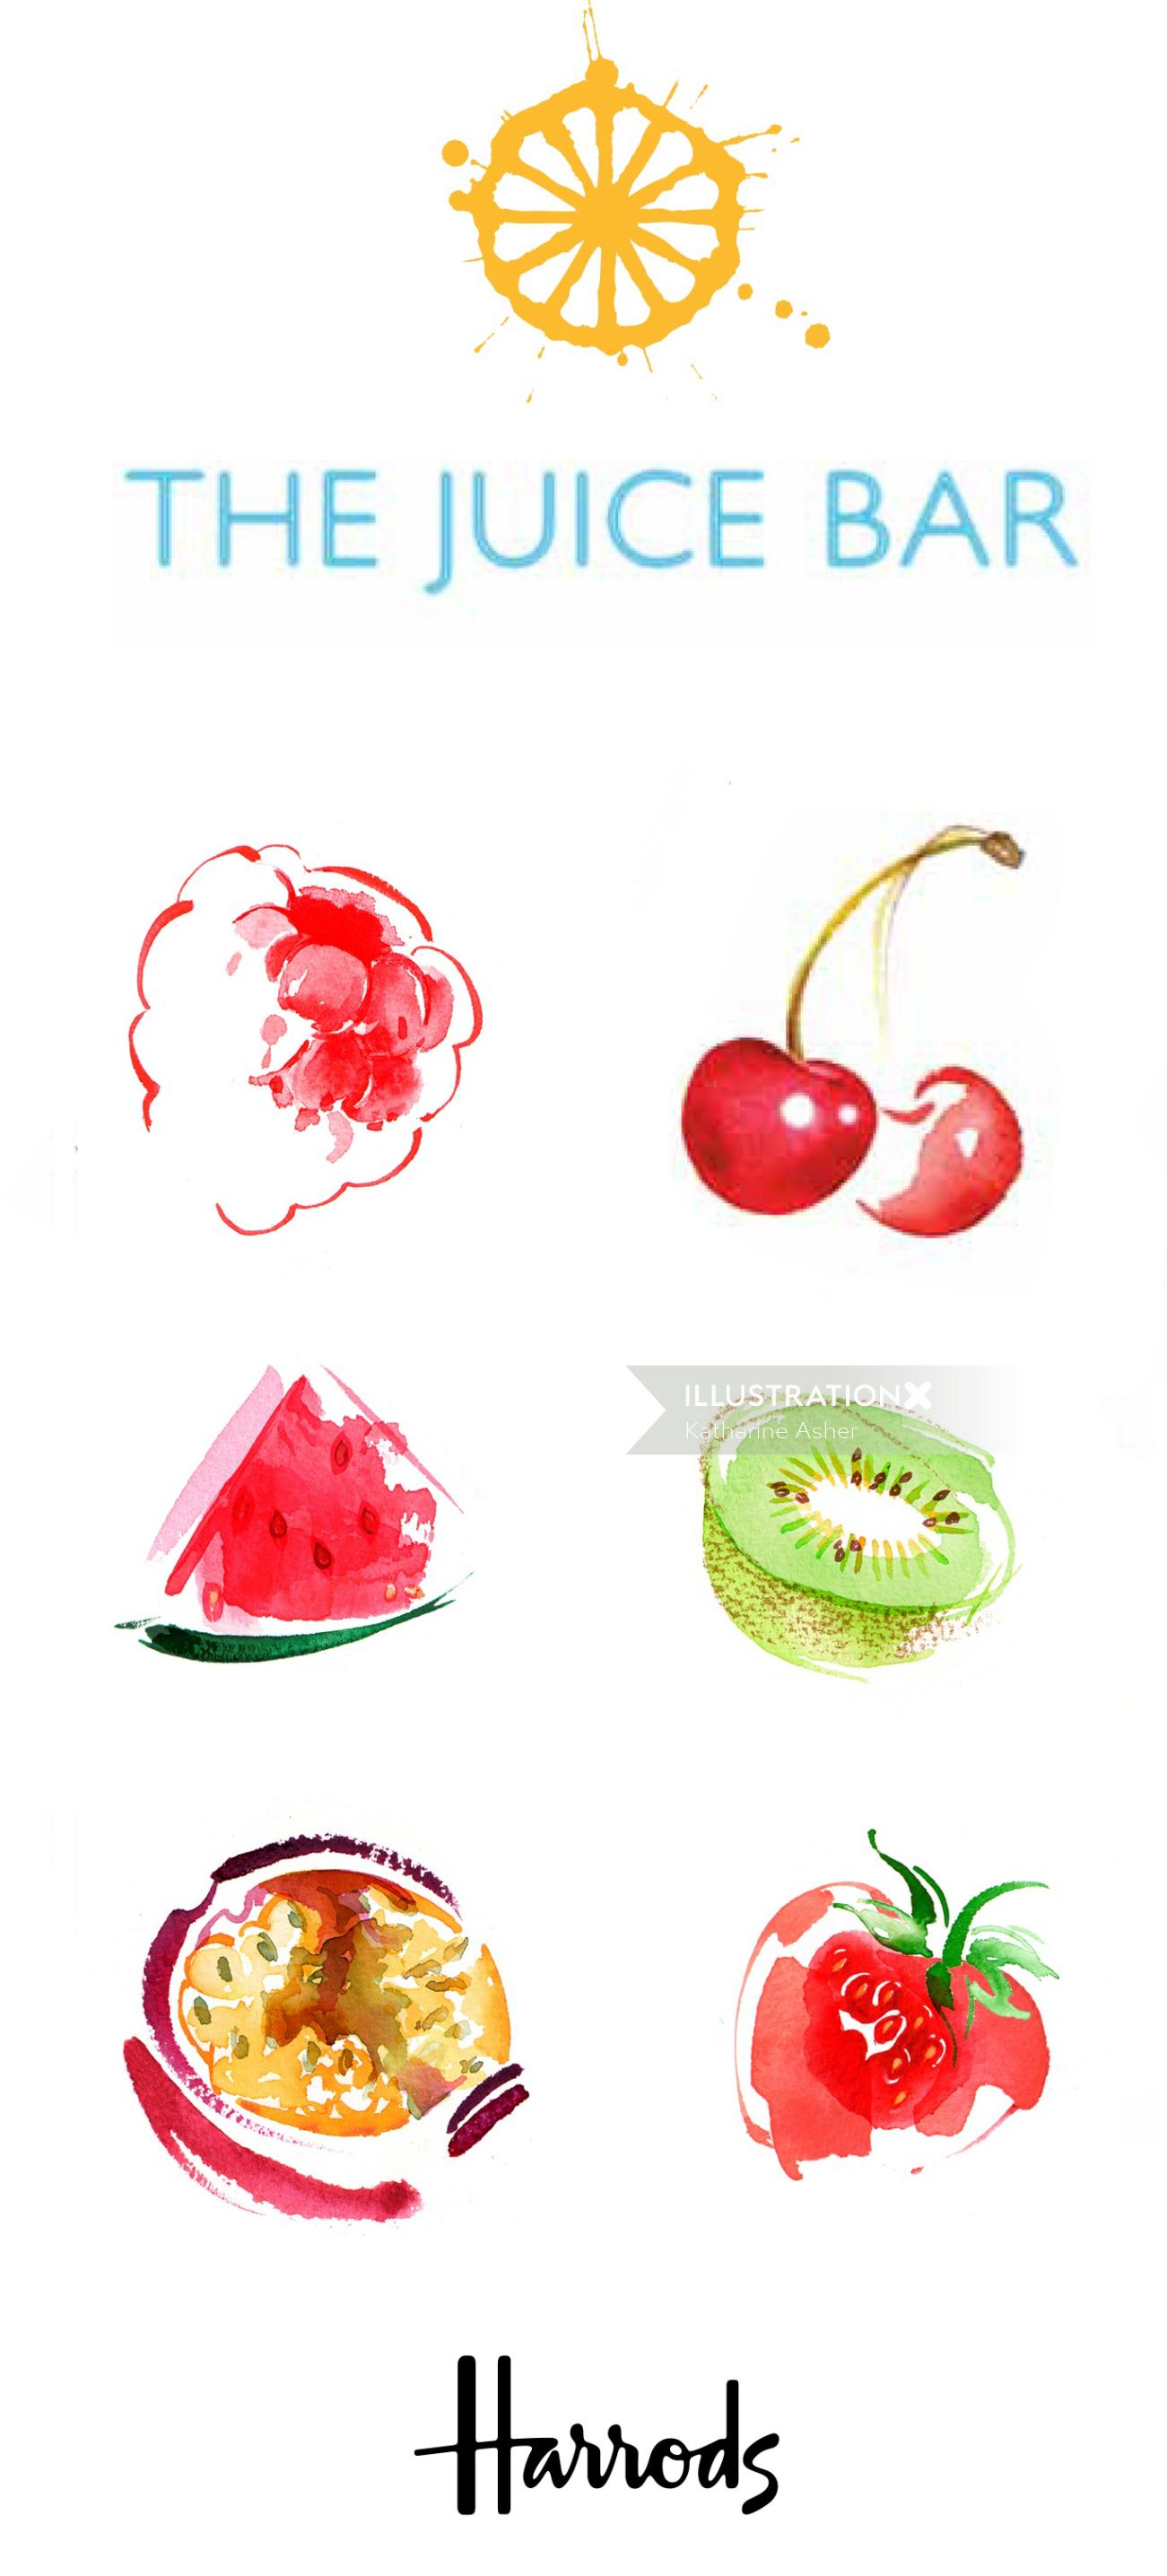 HARRODS - Juice Bar Menu watercolor illustration